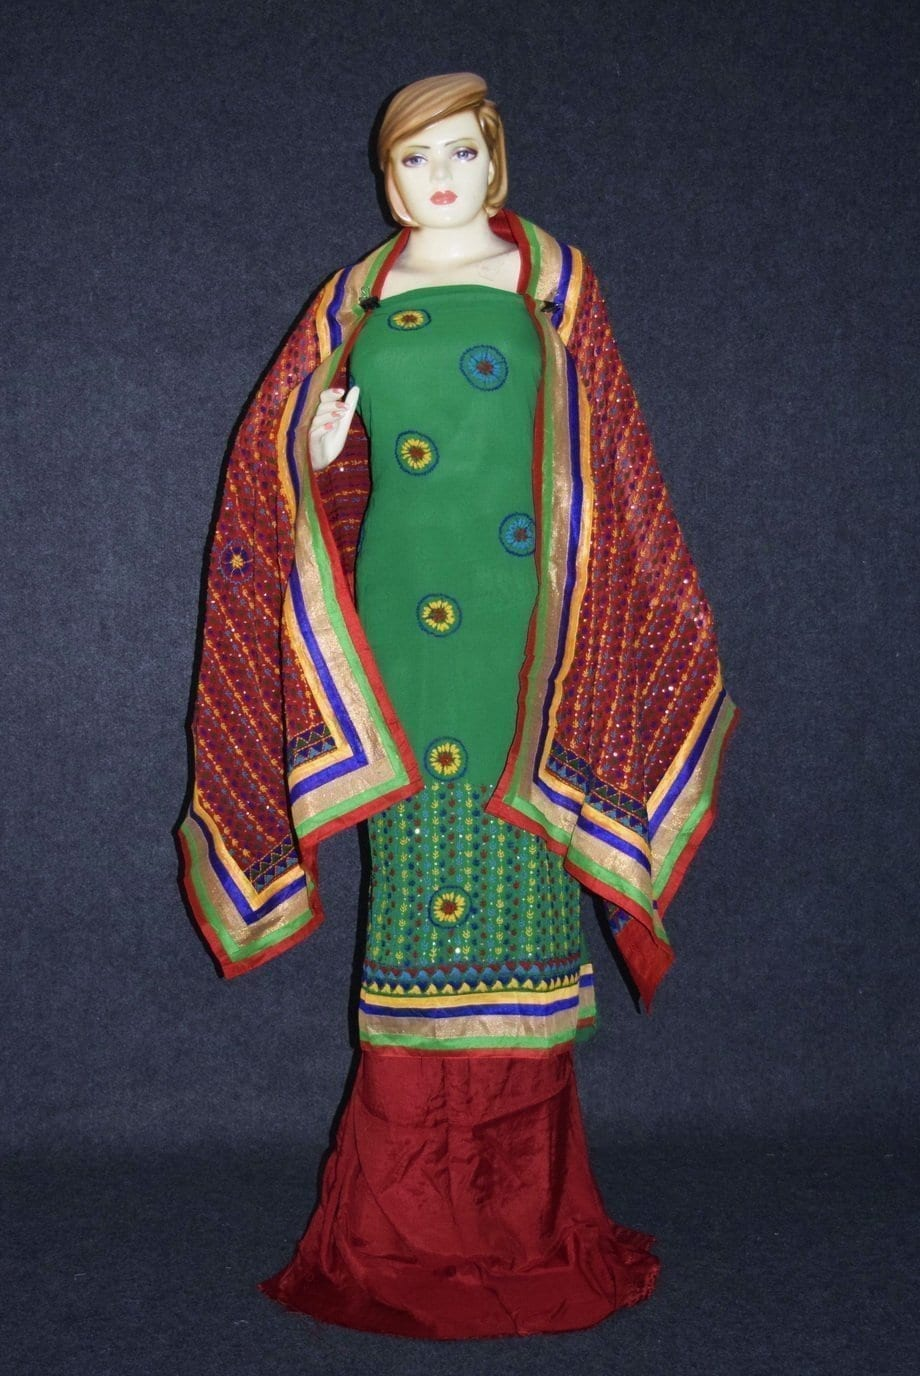 Party Wear Georgette hand Embroidered Salwar kameez stole suit set F0648 2